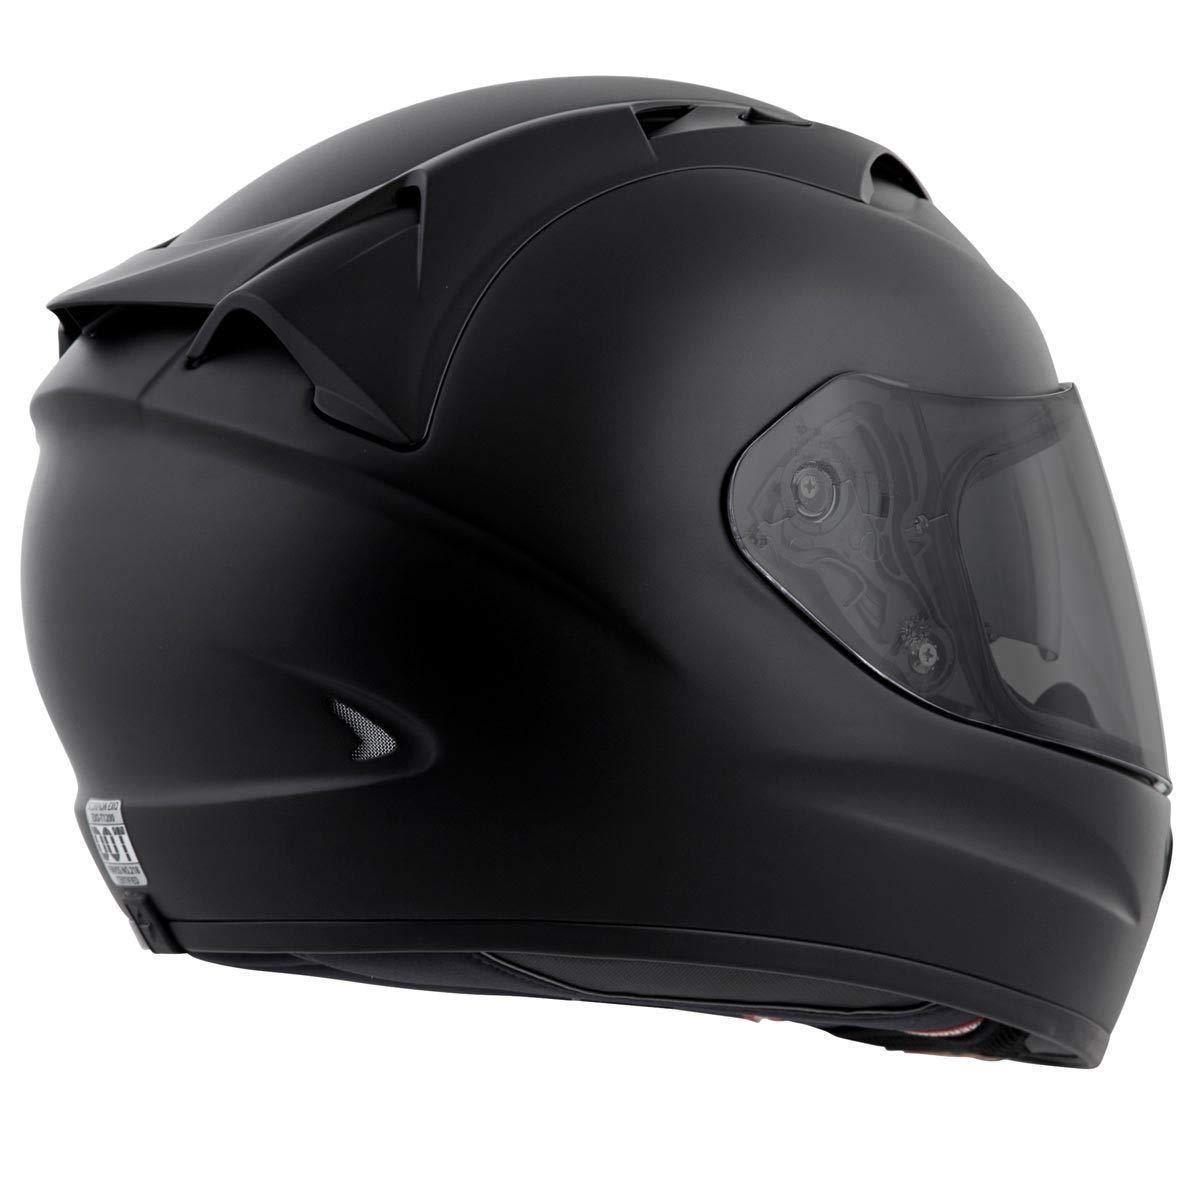 ff37cb31 Amazon.com: Scorpion EXO-T1200 Solid Street Motorcycle Helmet (Matte Black,  Medium): Automotive